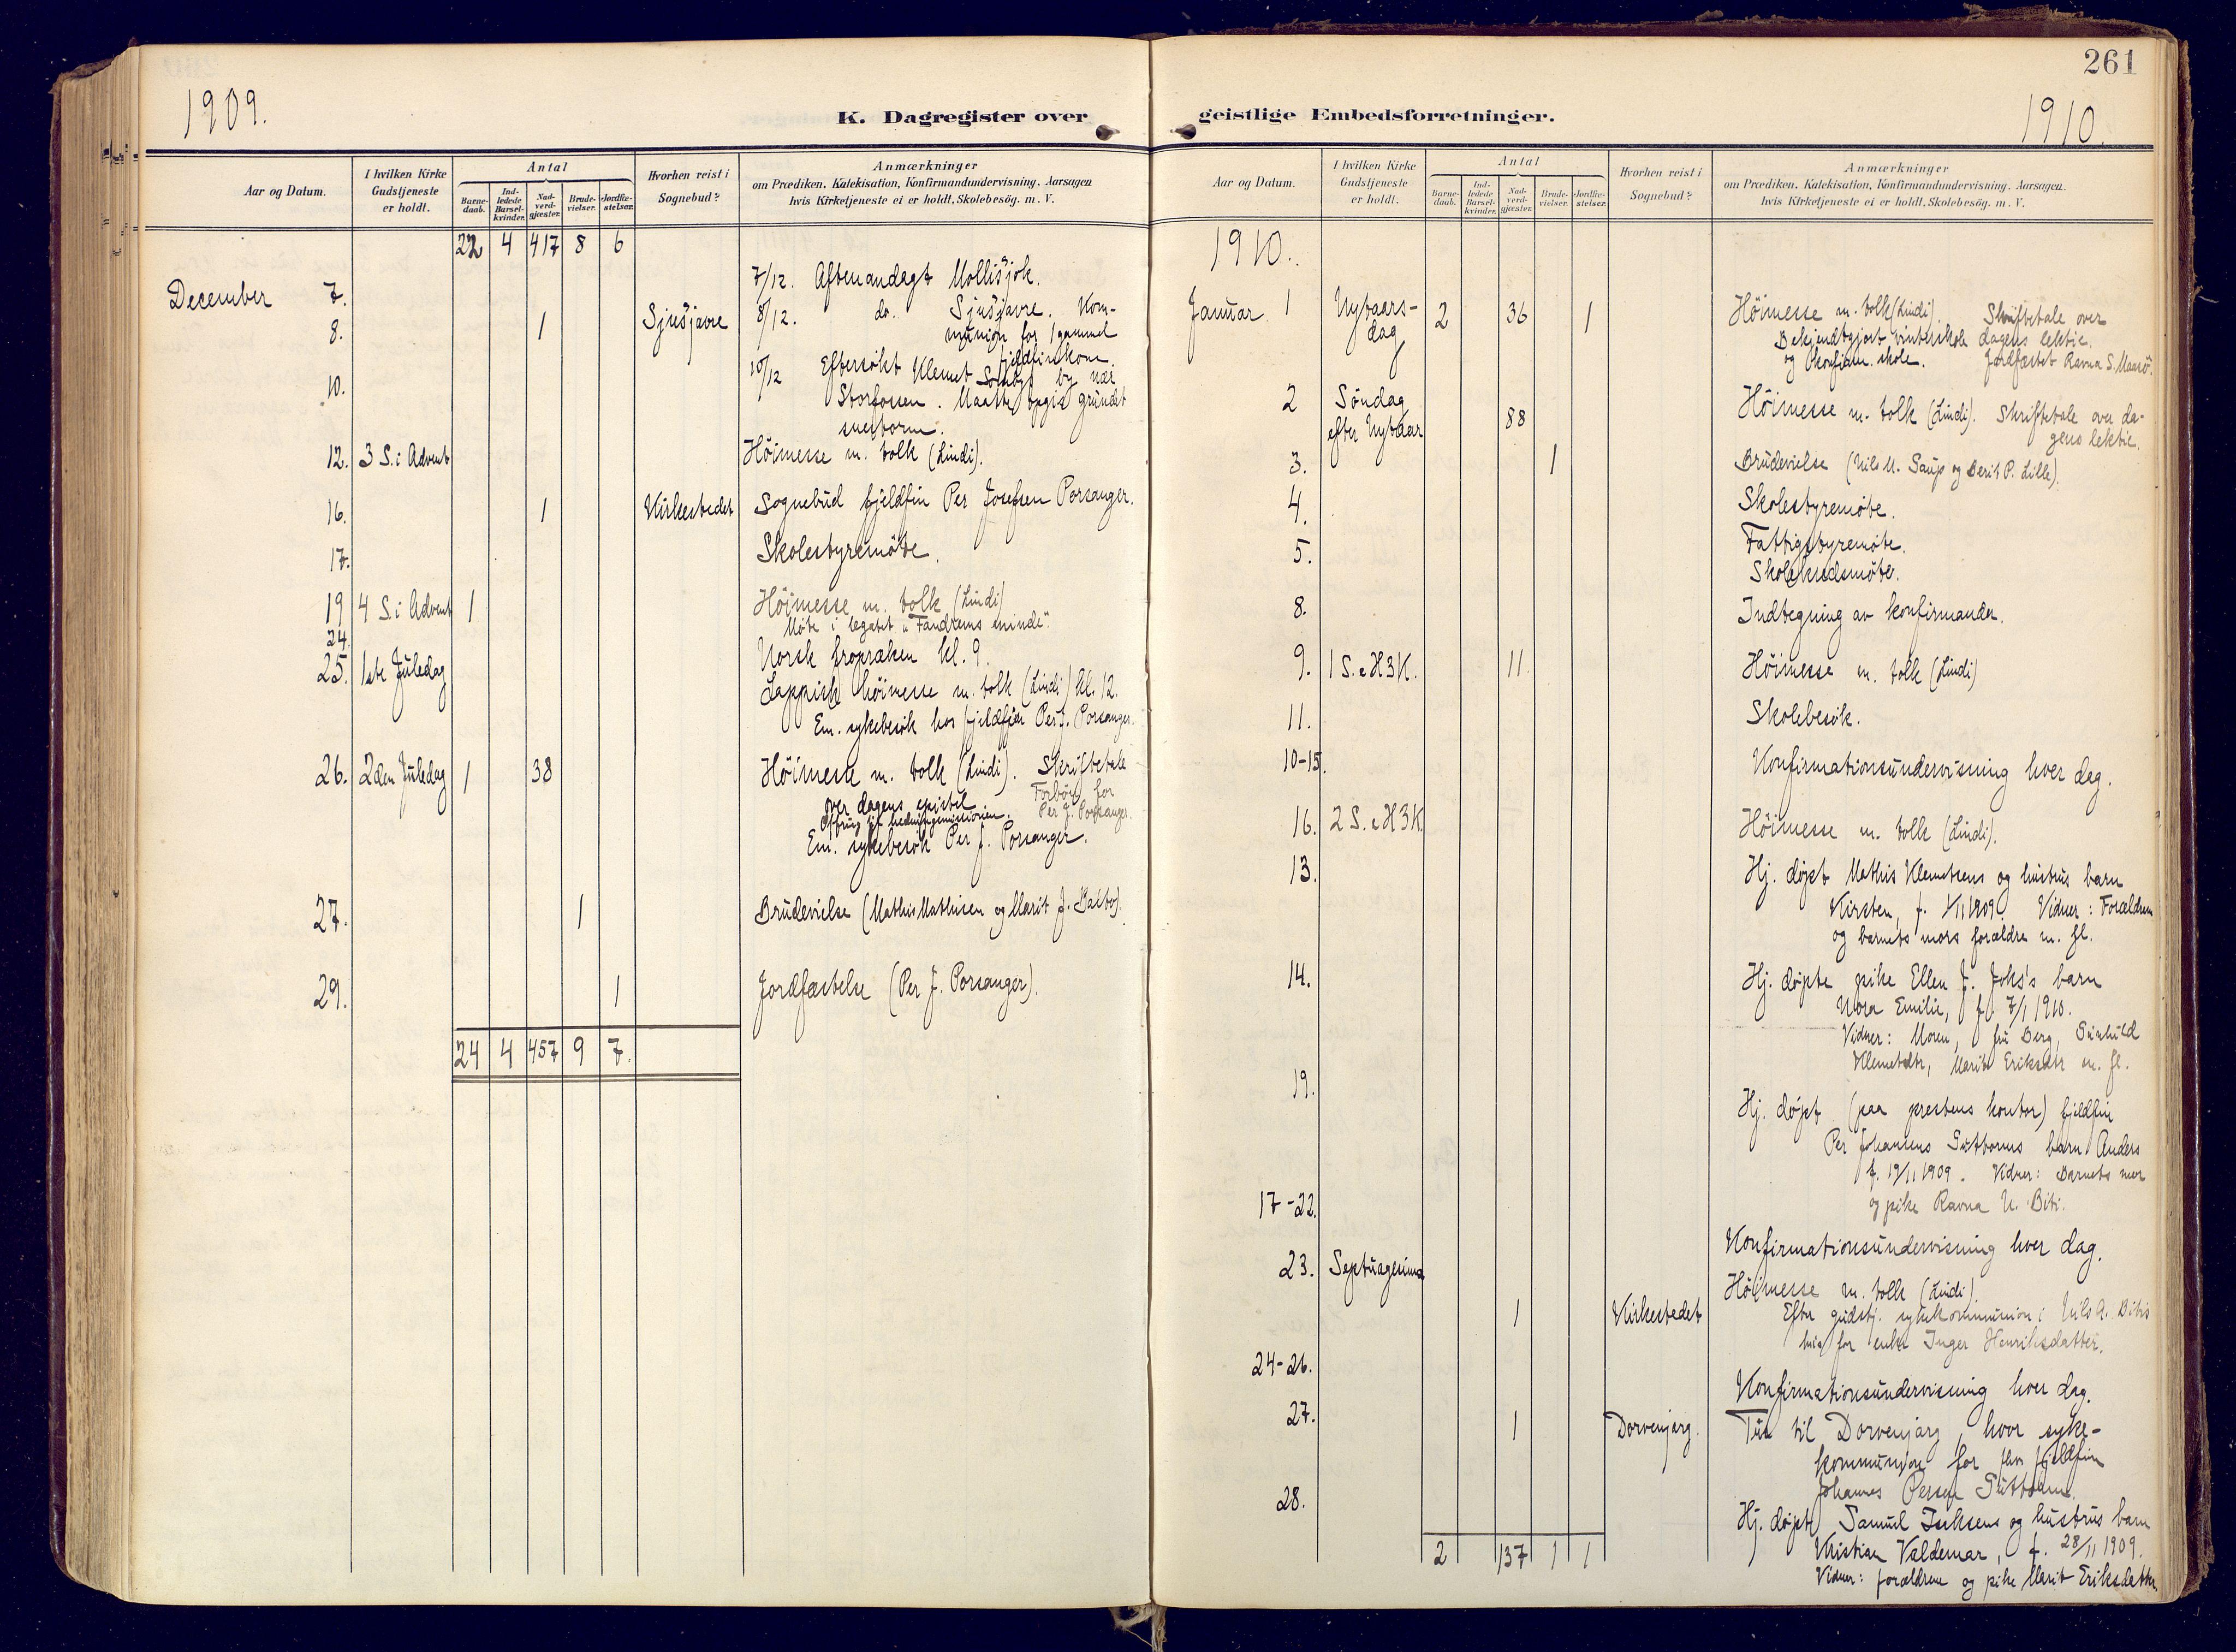 SATØ, Karasjok sokneprestkontor, H/Ha: Ministerialbok nr. 3, 1907-1926, s. 261